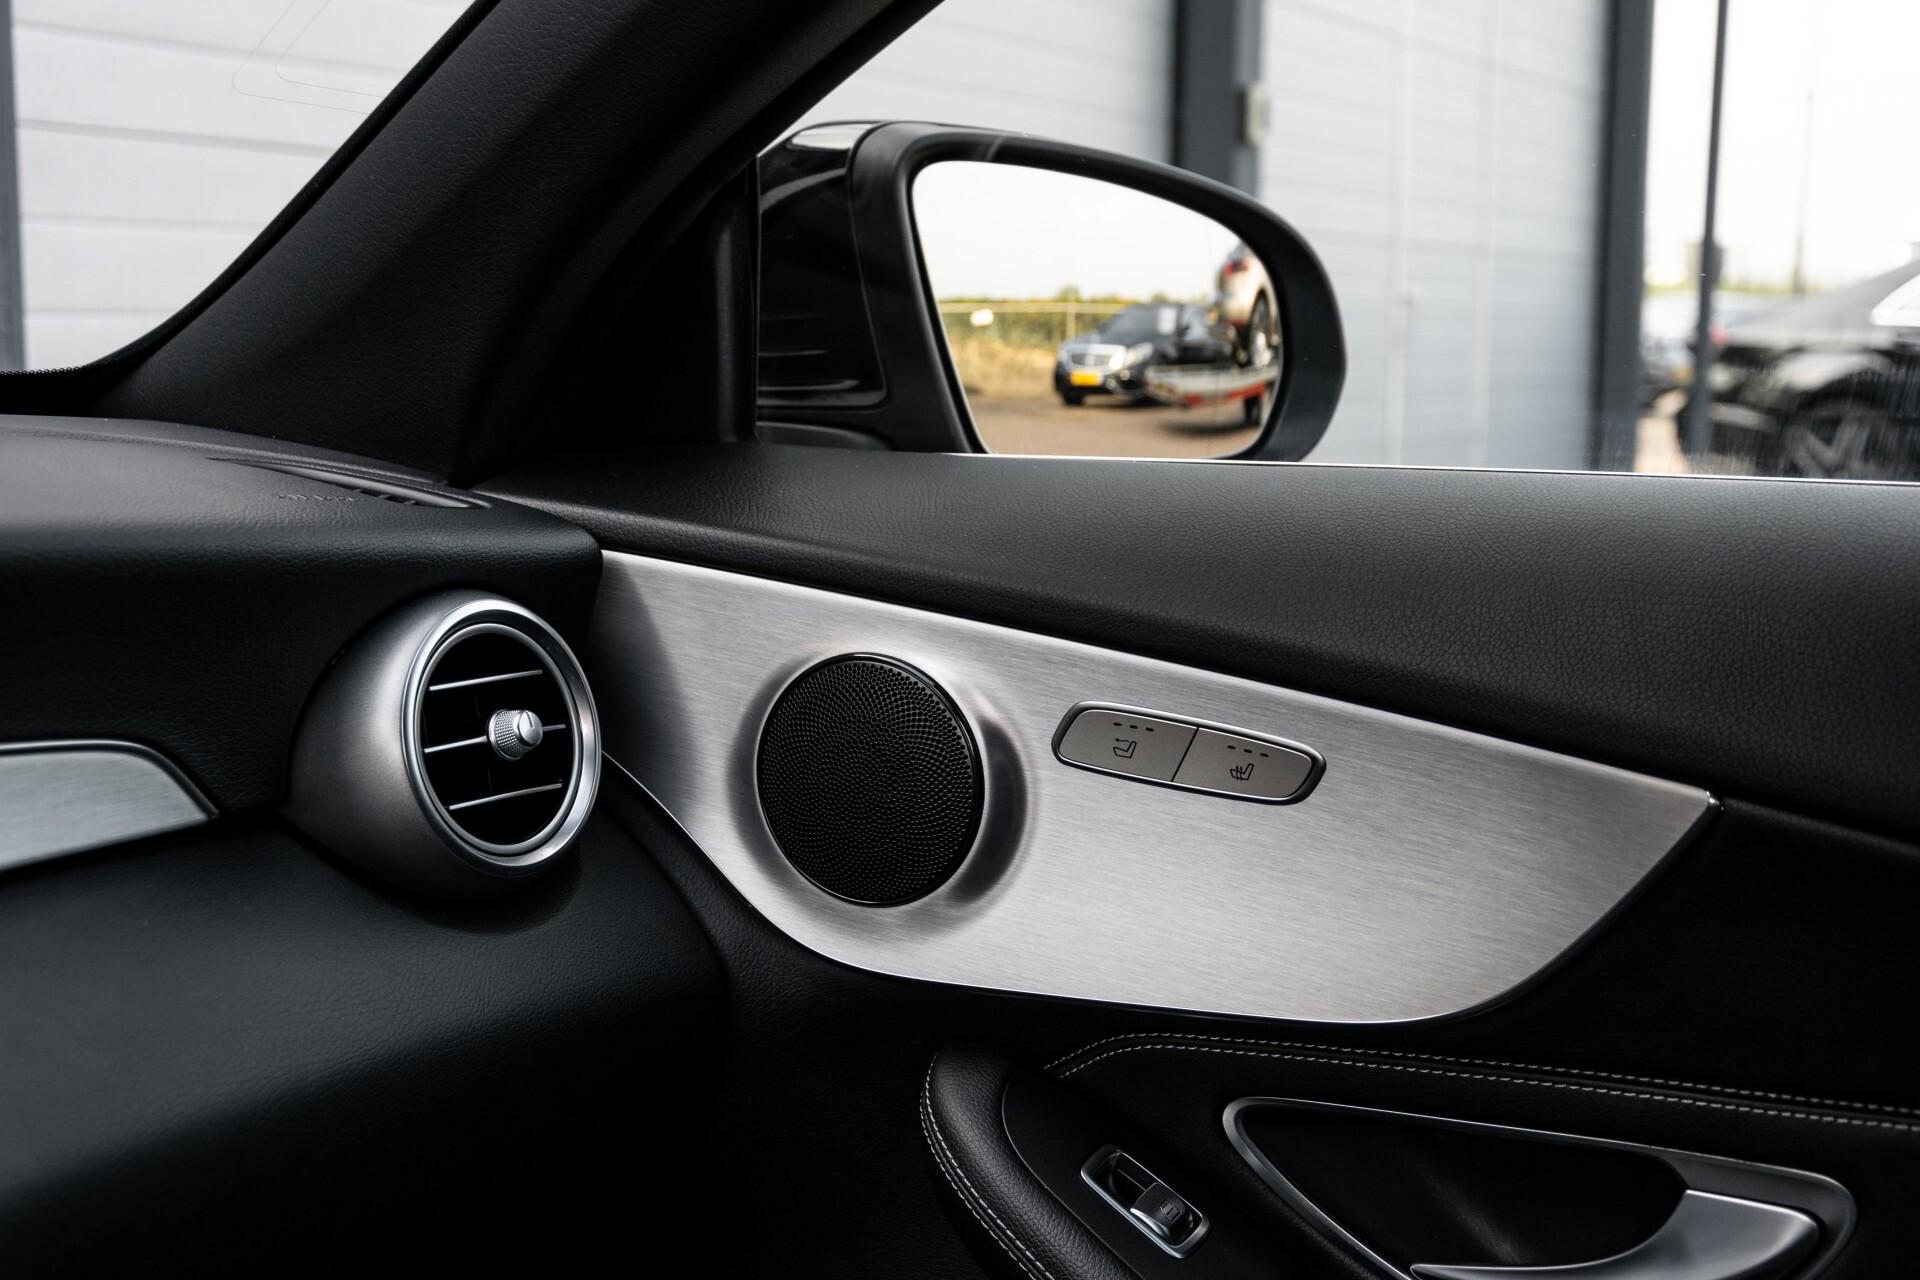 Mercedes-Benz C-Klasse Cabrio 250 AMG Airscarf/Aircap/Comand/ILS/Camera/Rode cabriokap Aut9 Foto 43